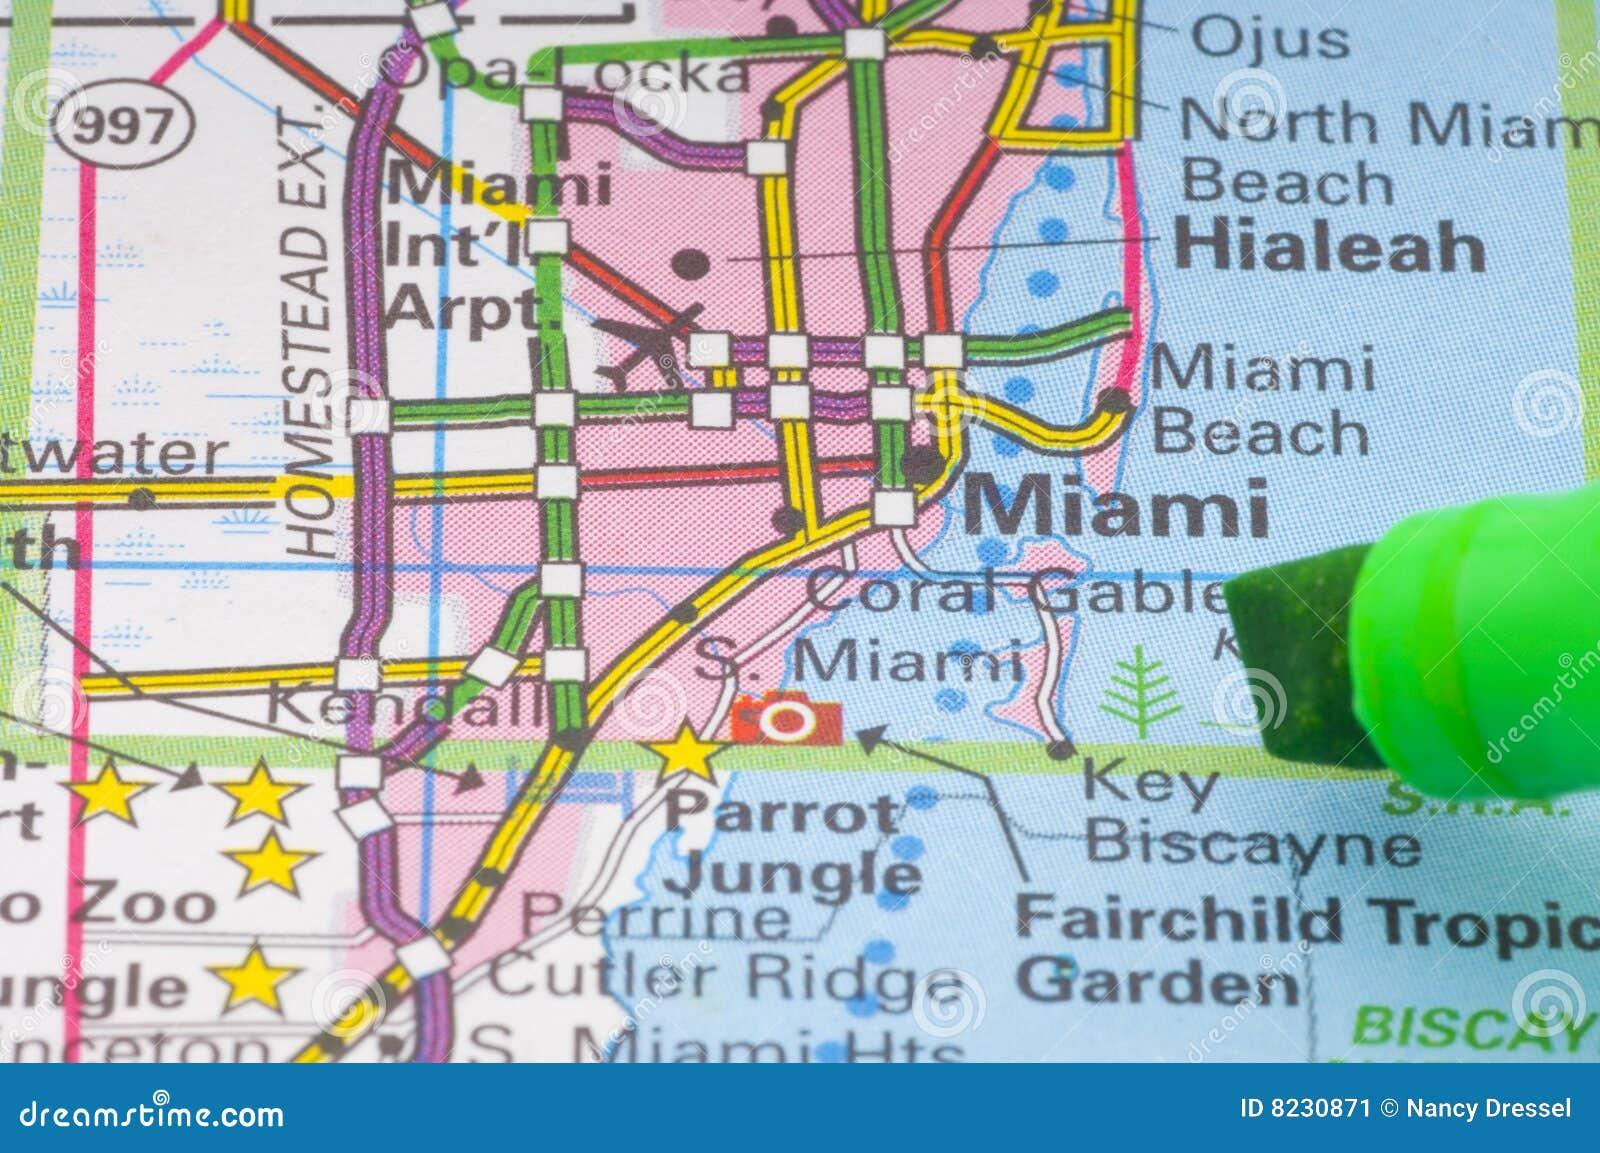 Detailed Florida Map.Florida Map Detail Stock Image Image Of Background Coastline 8230871